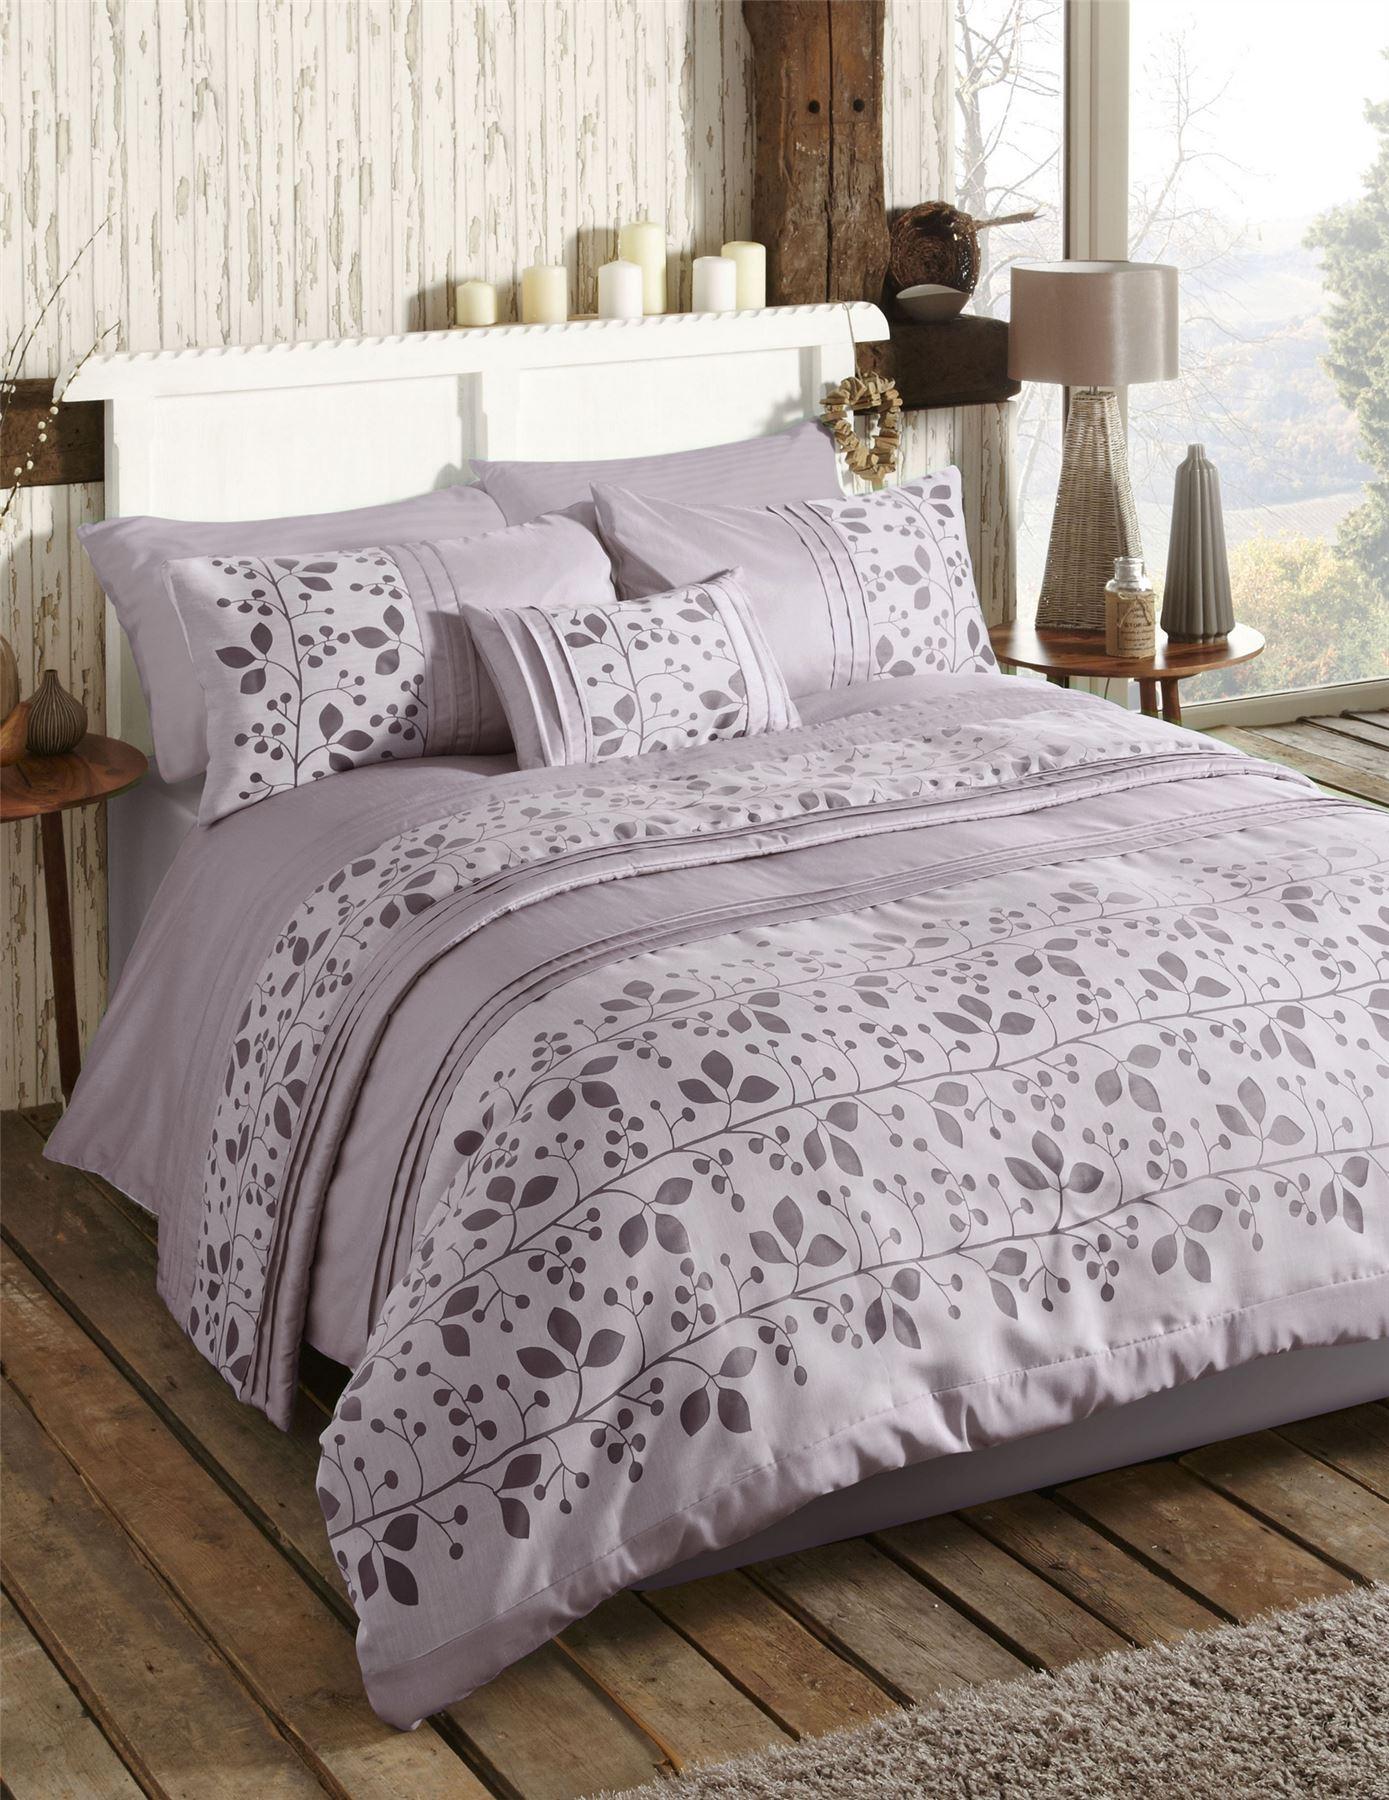 Modern Leaf Nature Themed Quilt Duvet Cover Bed Sets Bedding New CHEAP! | eBay